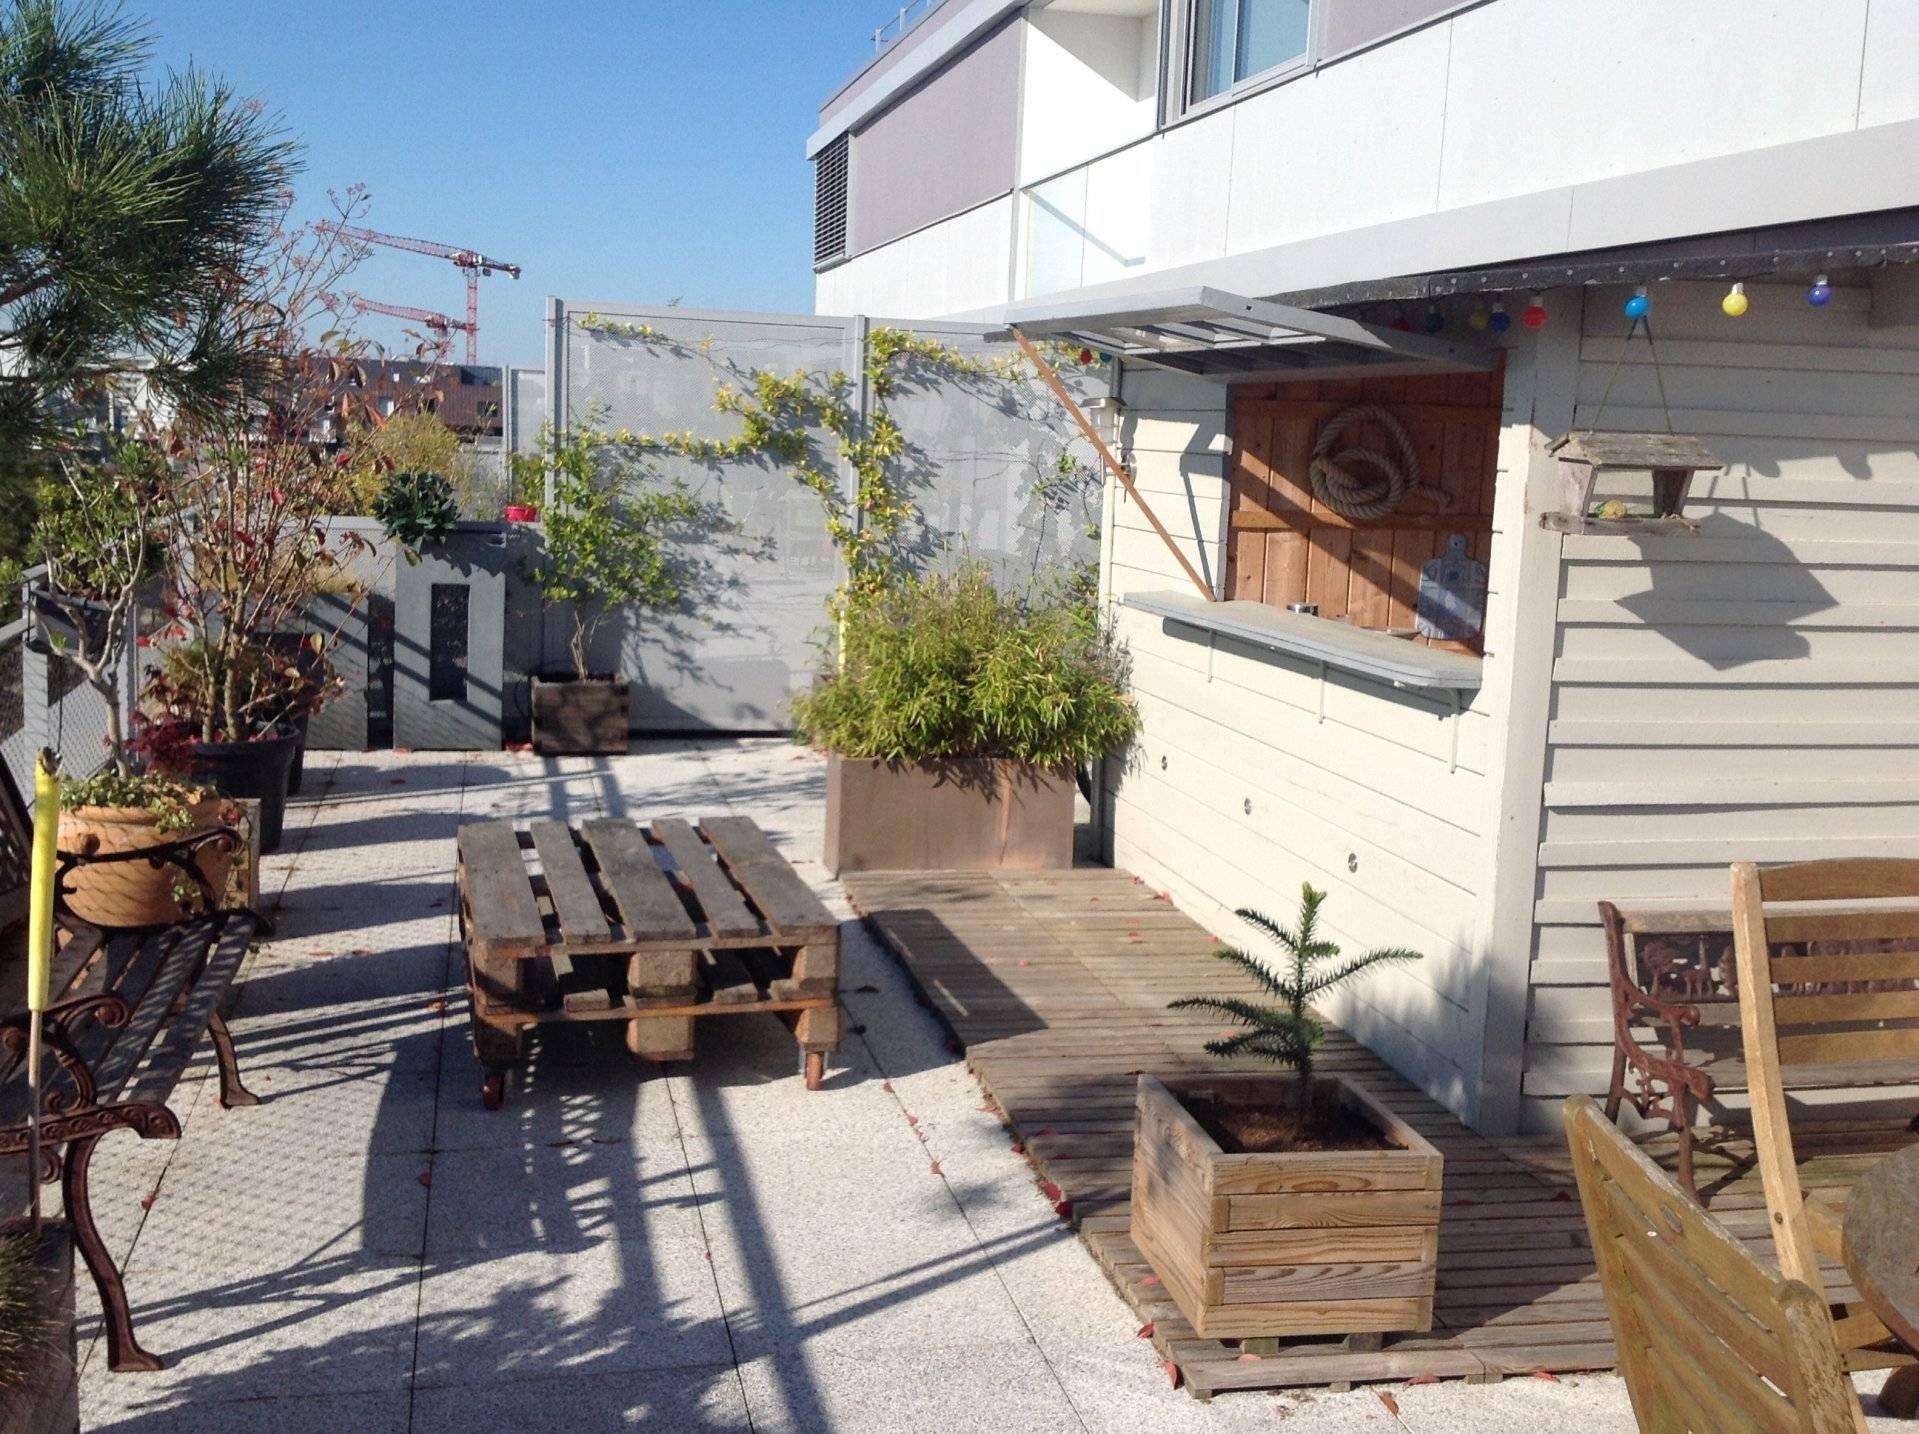 bel appartement neuf en duplex avec terrasse vendre bordeaux coldwell banker. Black Bedroom Furniture Sets. Home Design Ideas